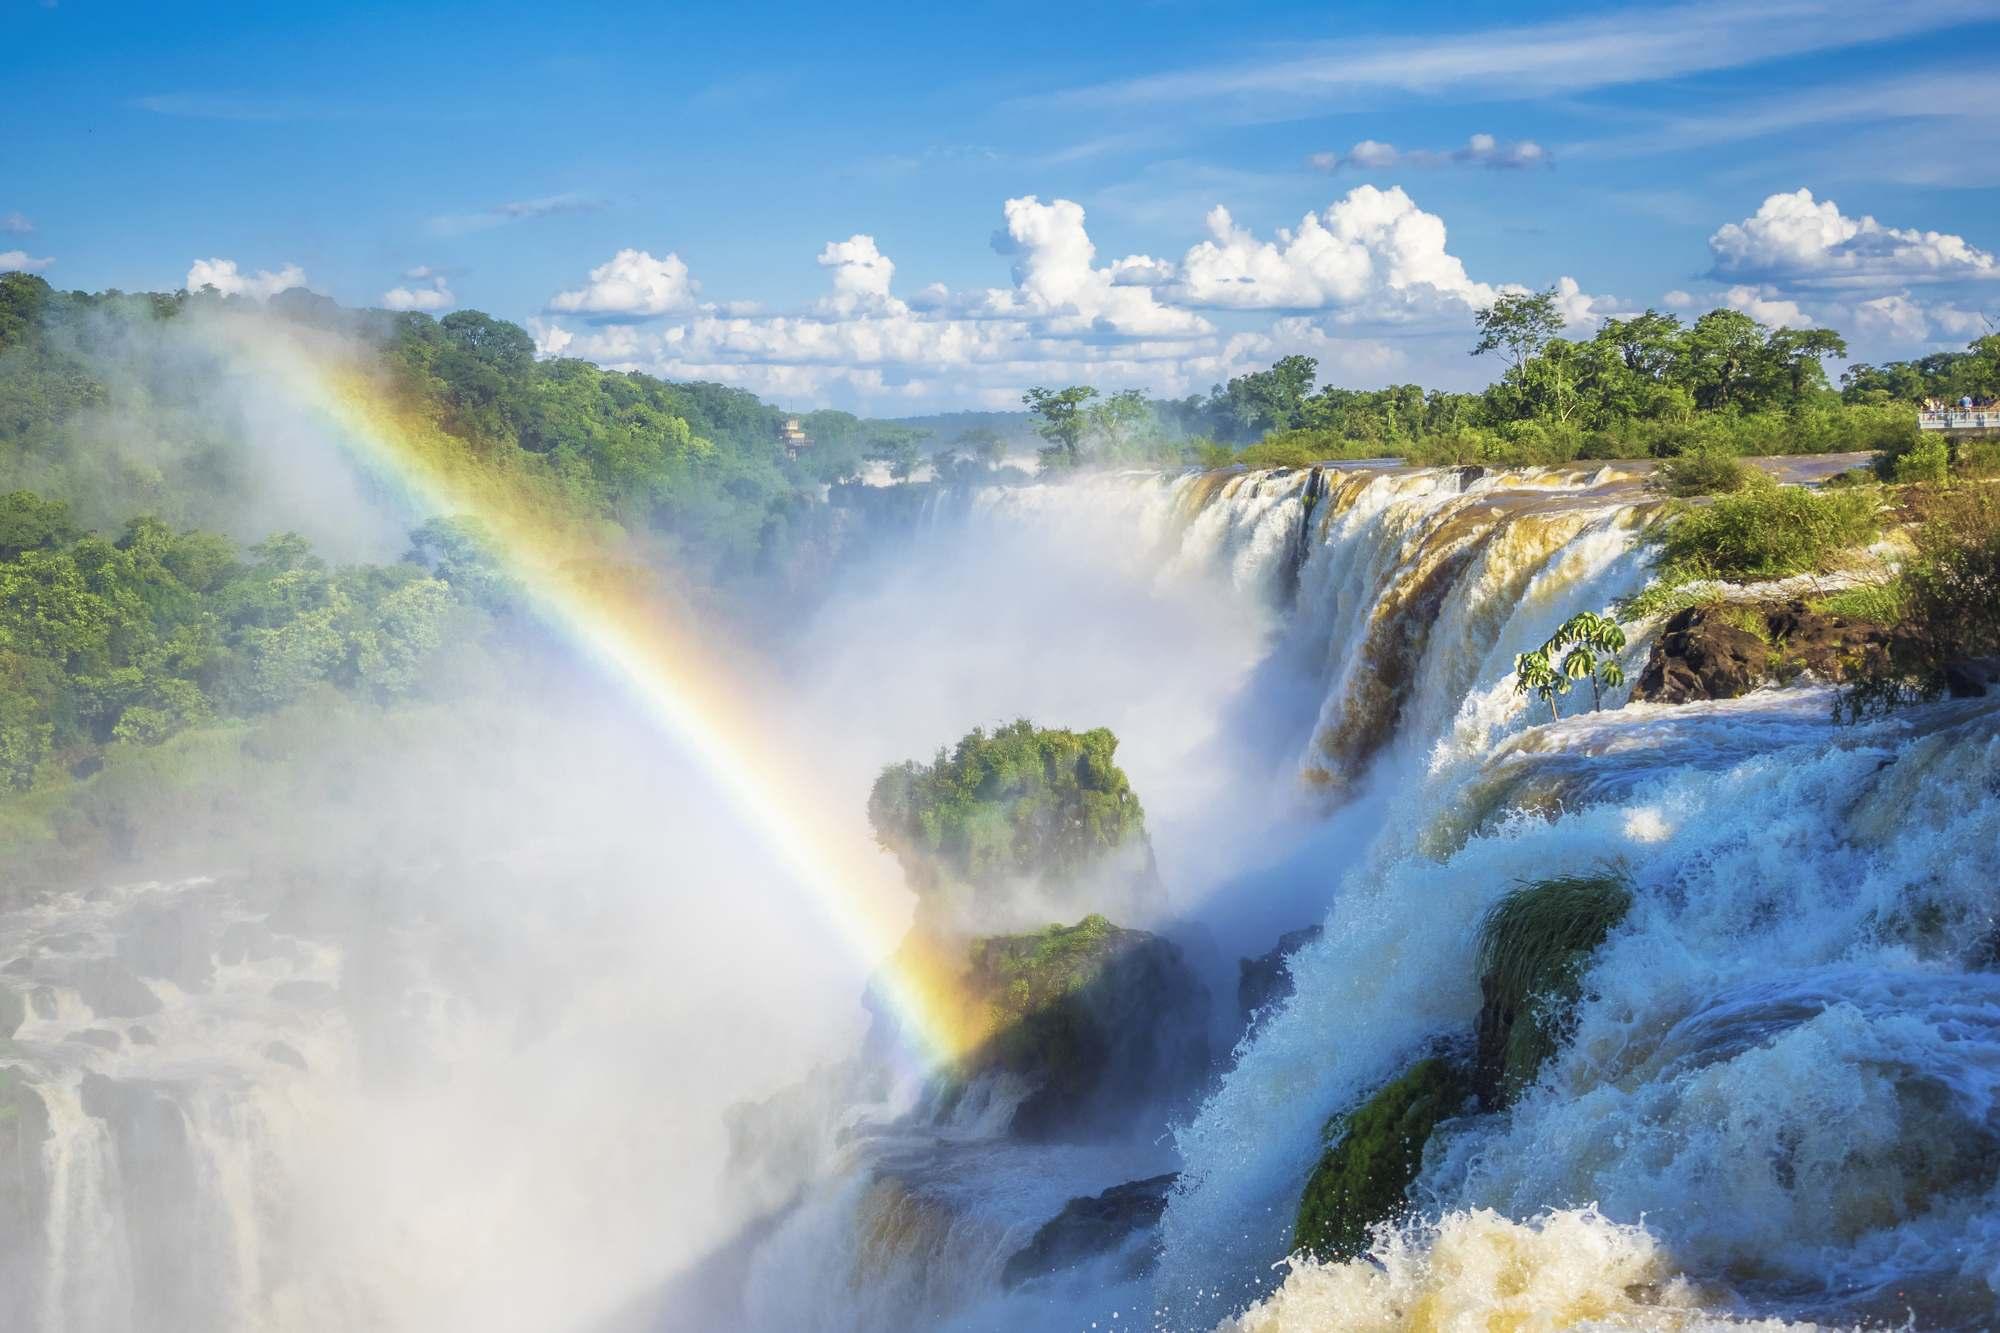 iguazu-falls-depositphotos_109989872_2000px-reduced